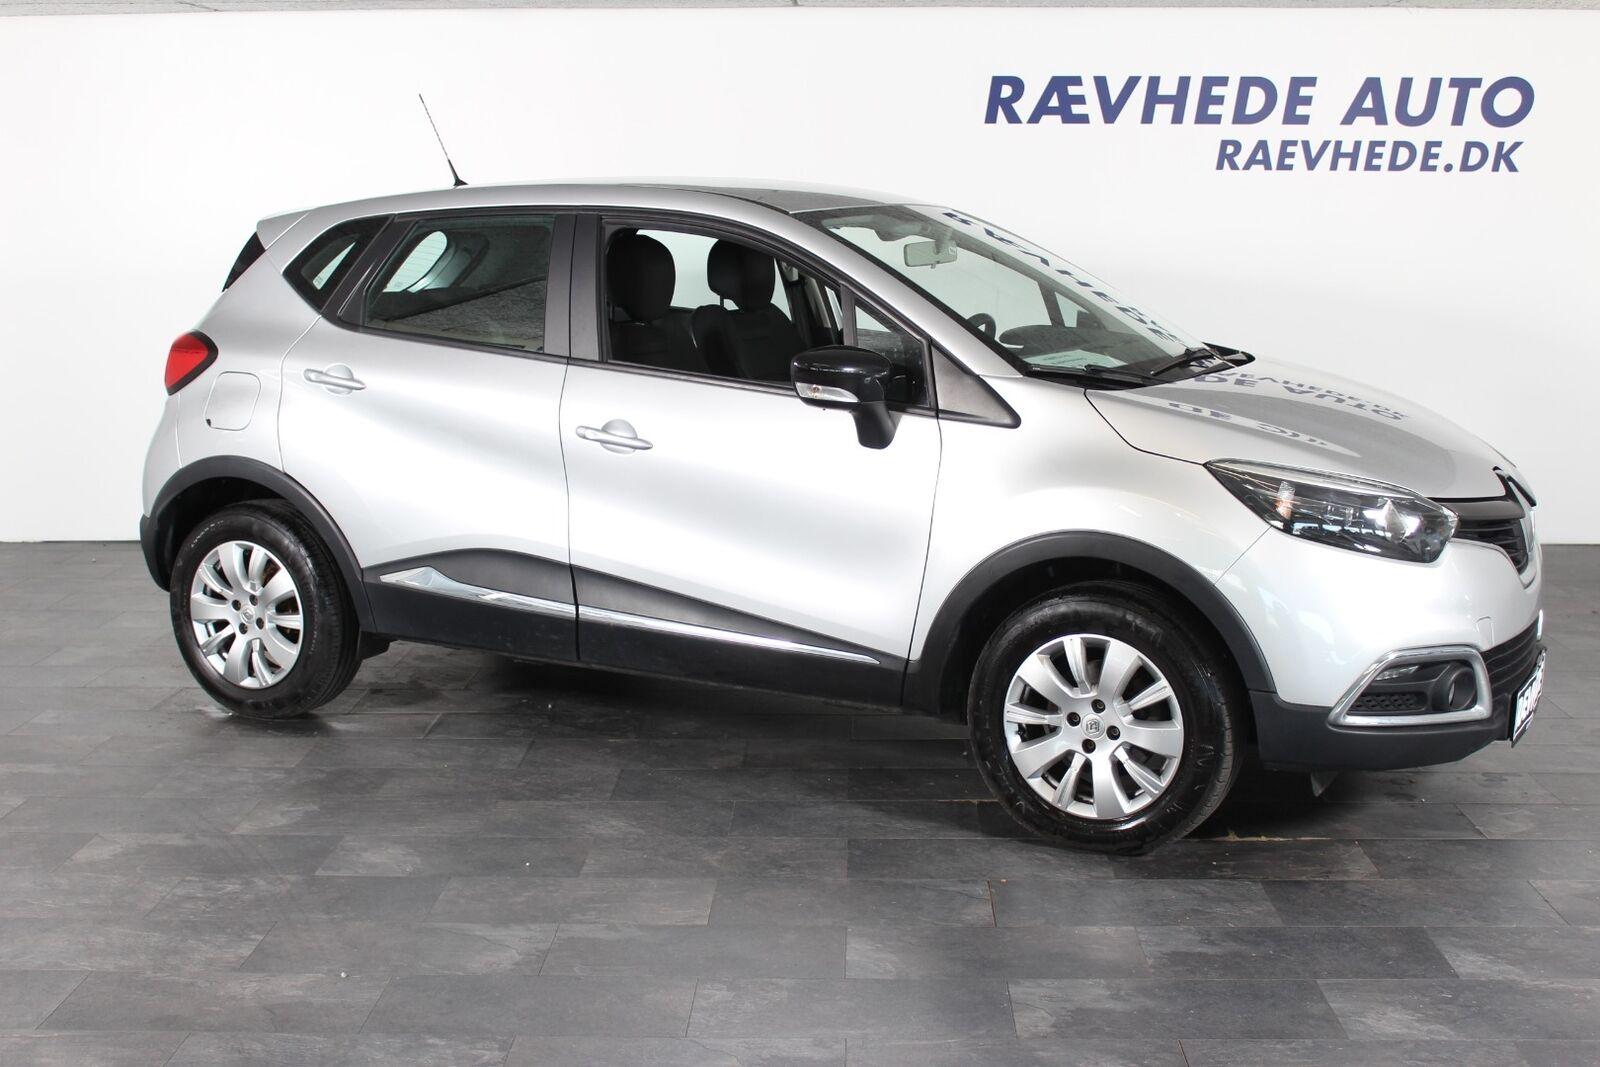 Renault Captur 1,5 dCi 90 Expression 5d - 89.900 kr.